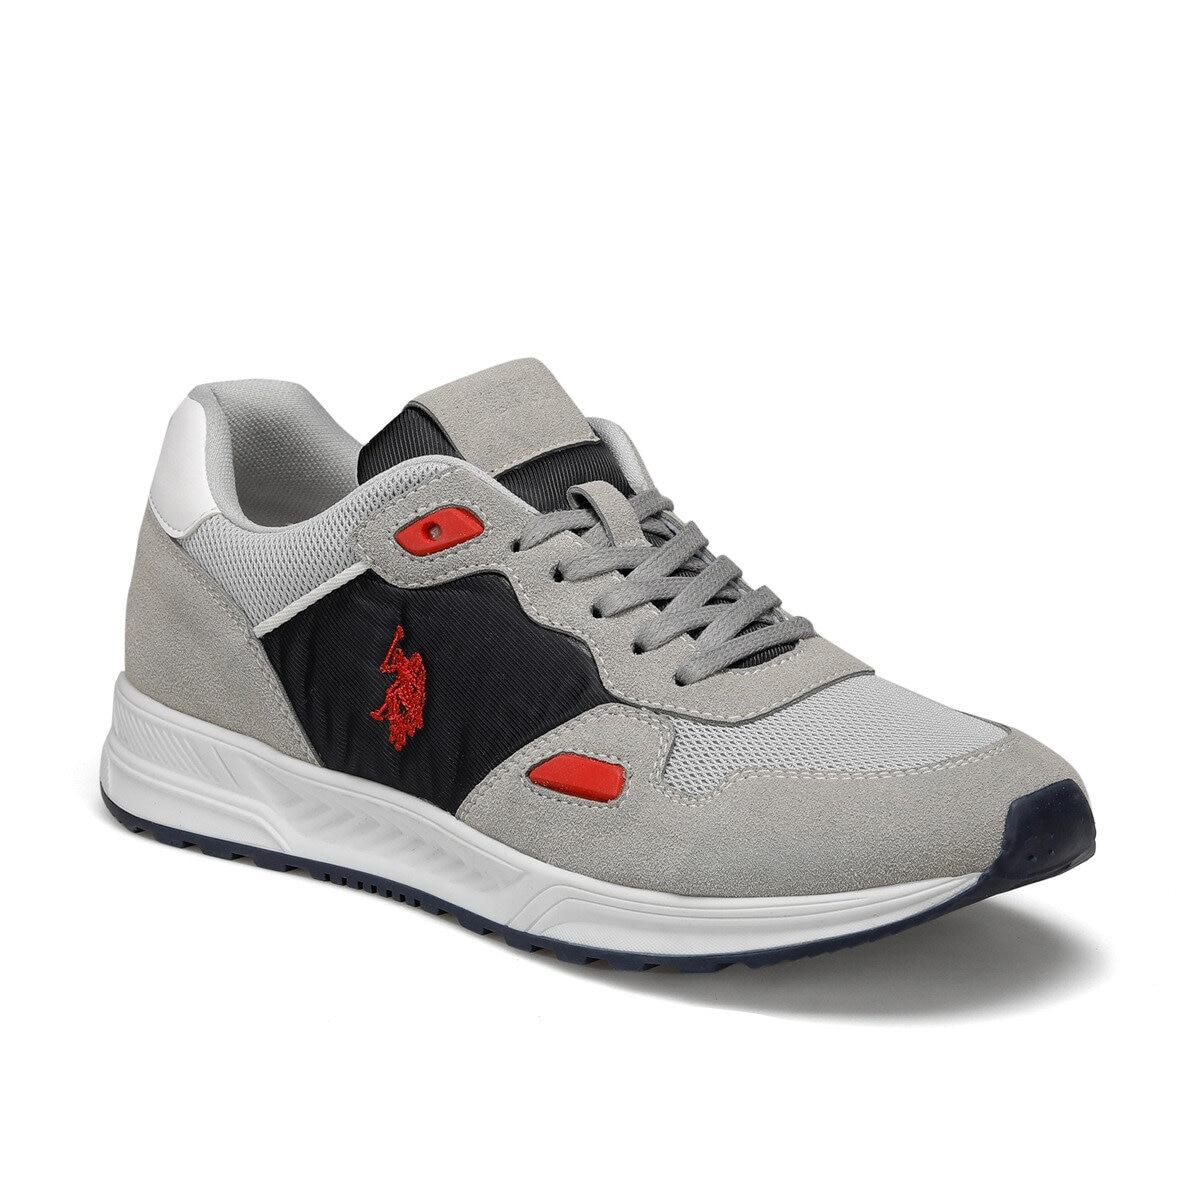 FLO NORAHO White Men 'S Sports Shoes U.S. POLO ASSN.